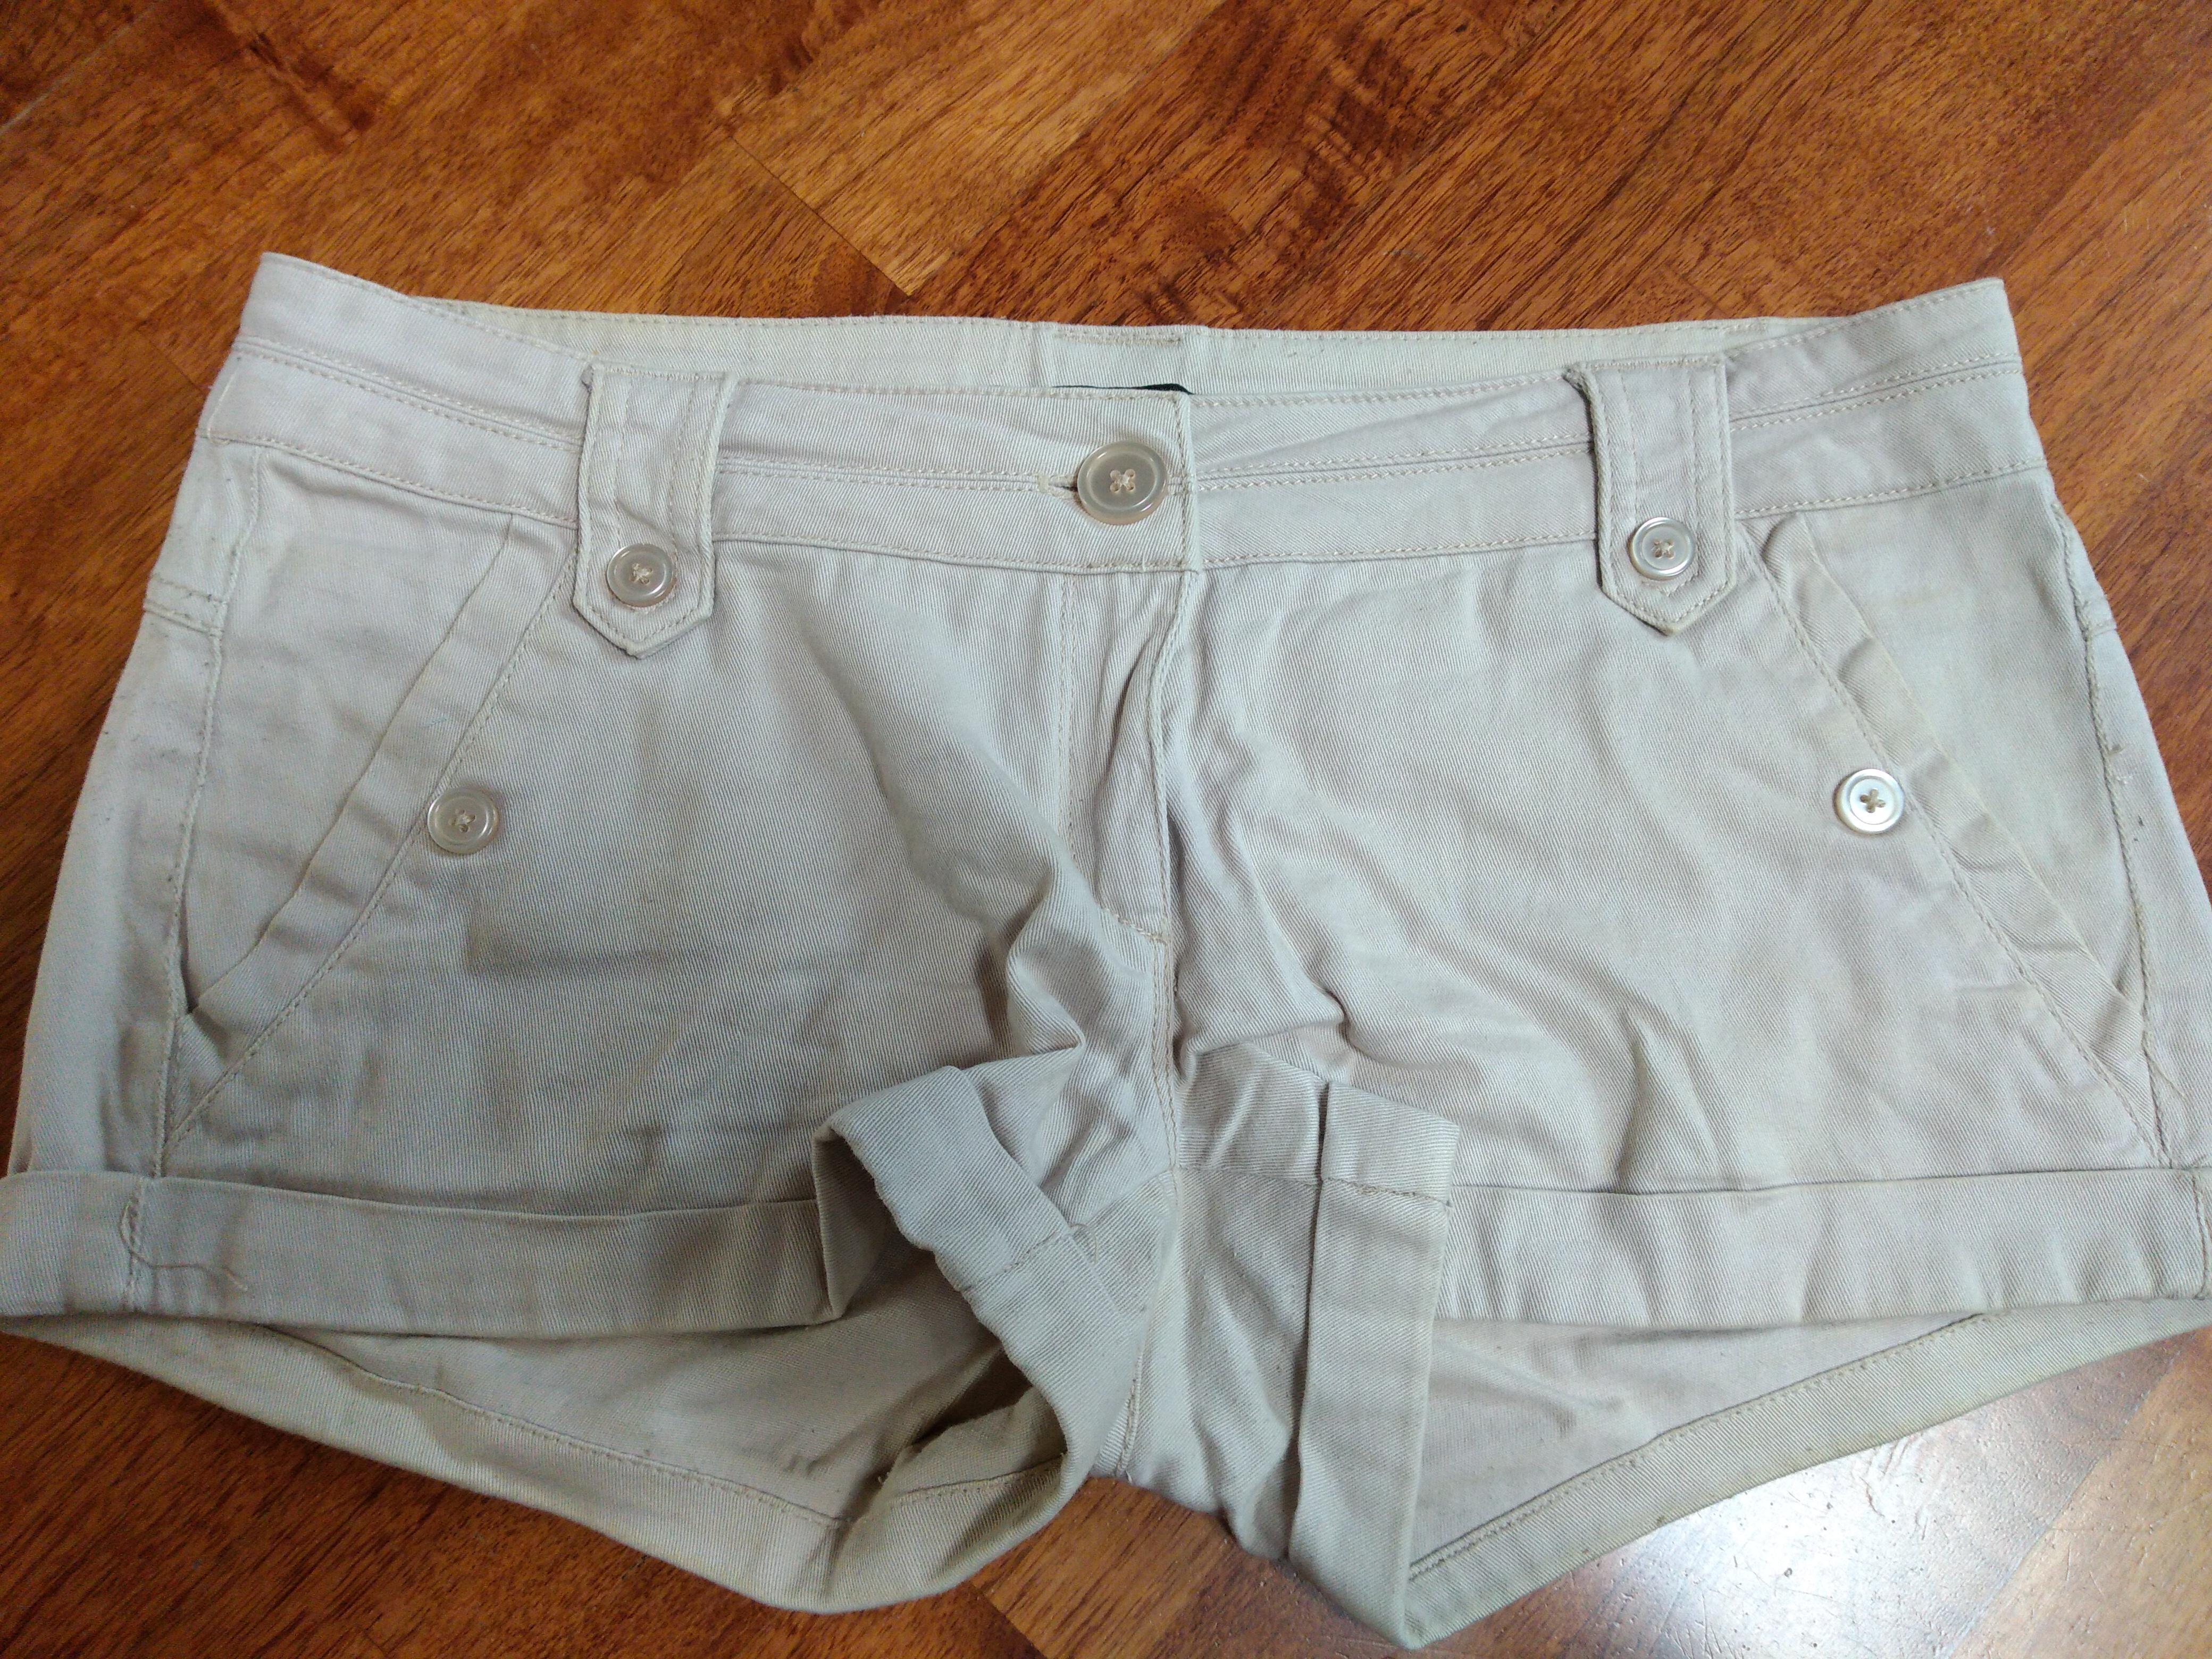 kurze Hose beige Shorts Gr M tauschen